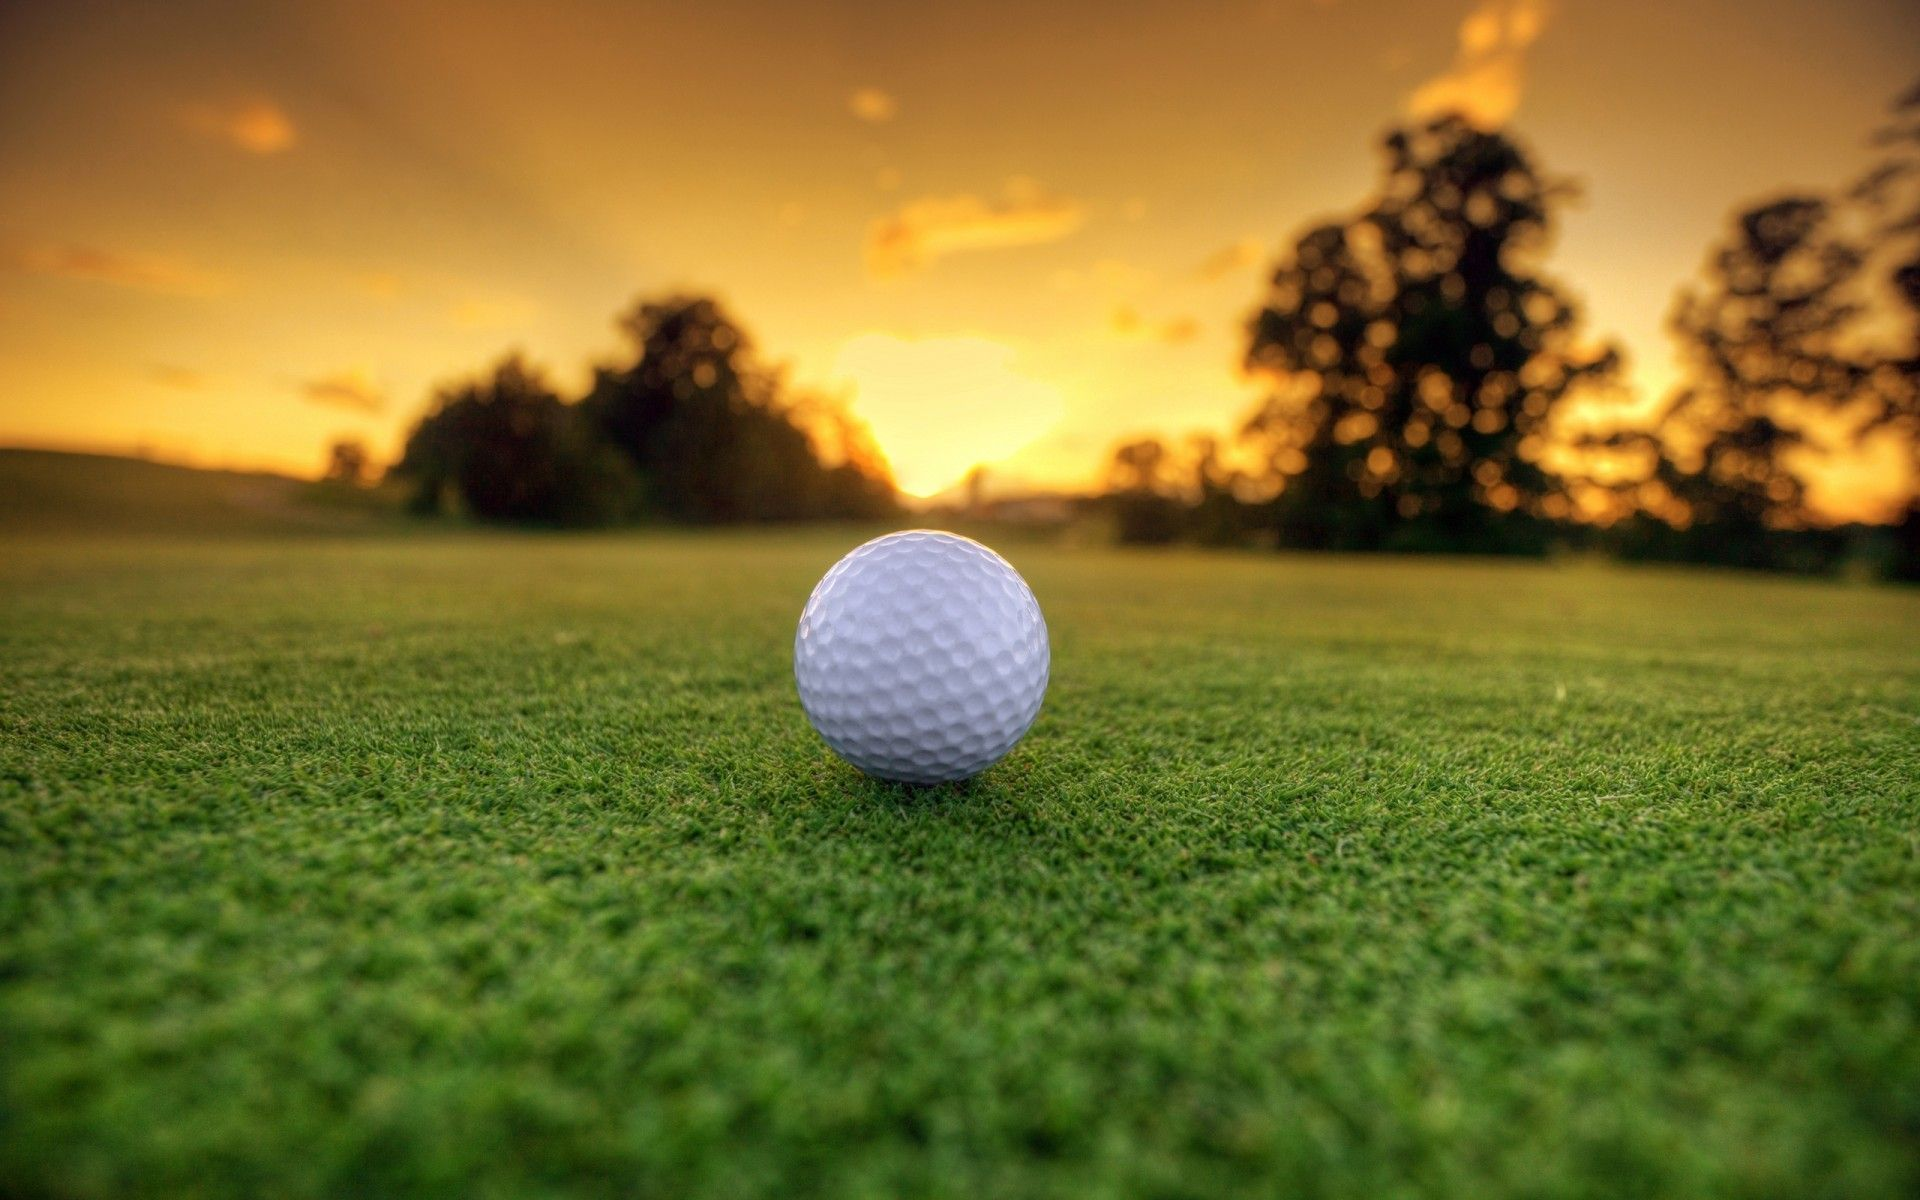 golf background images